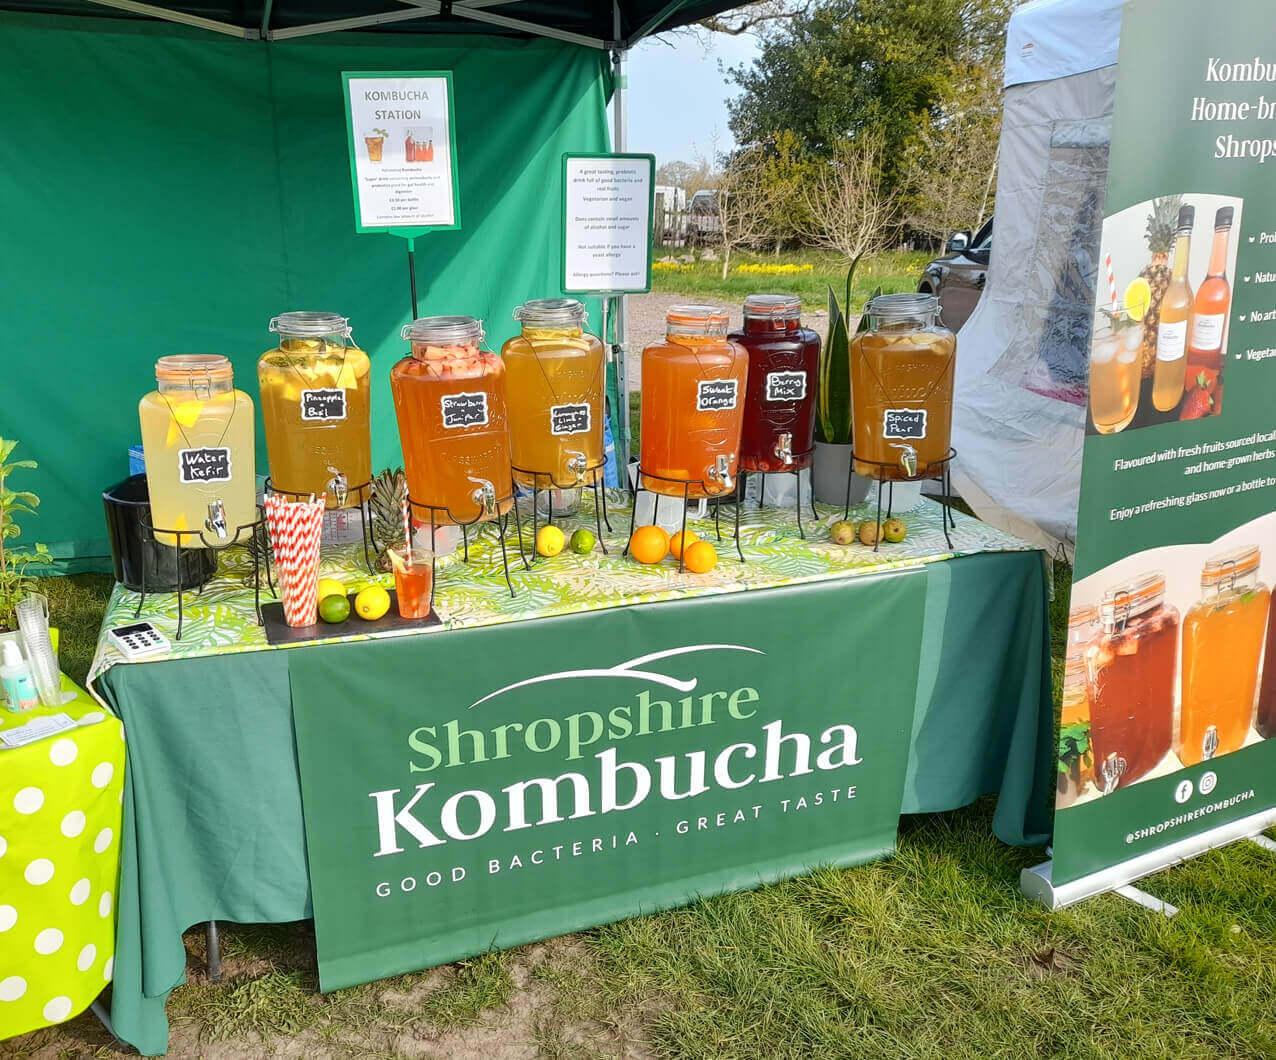 branded Shropshire kombucha market stand